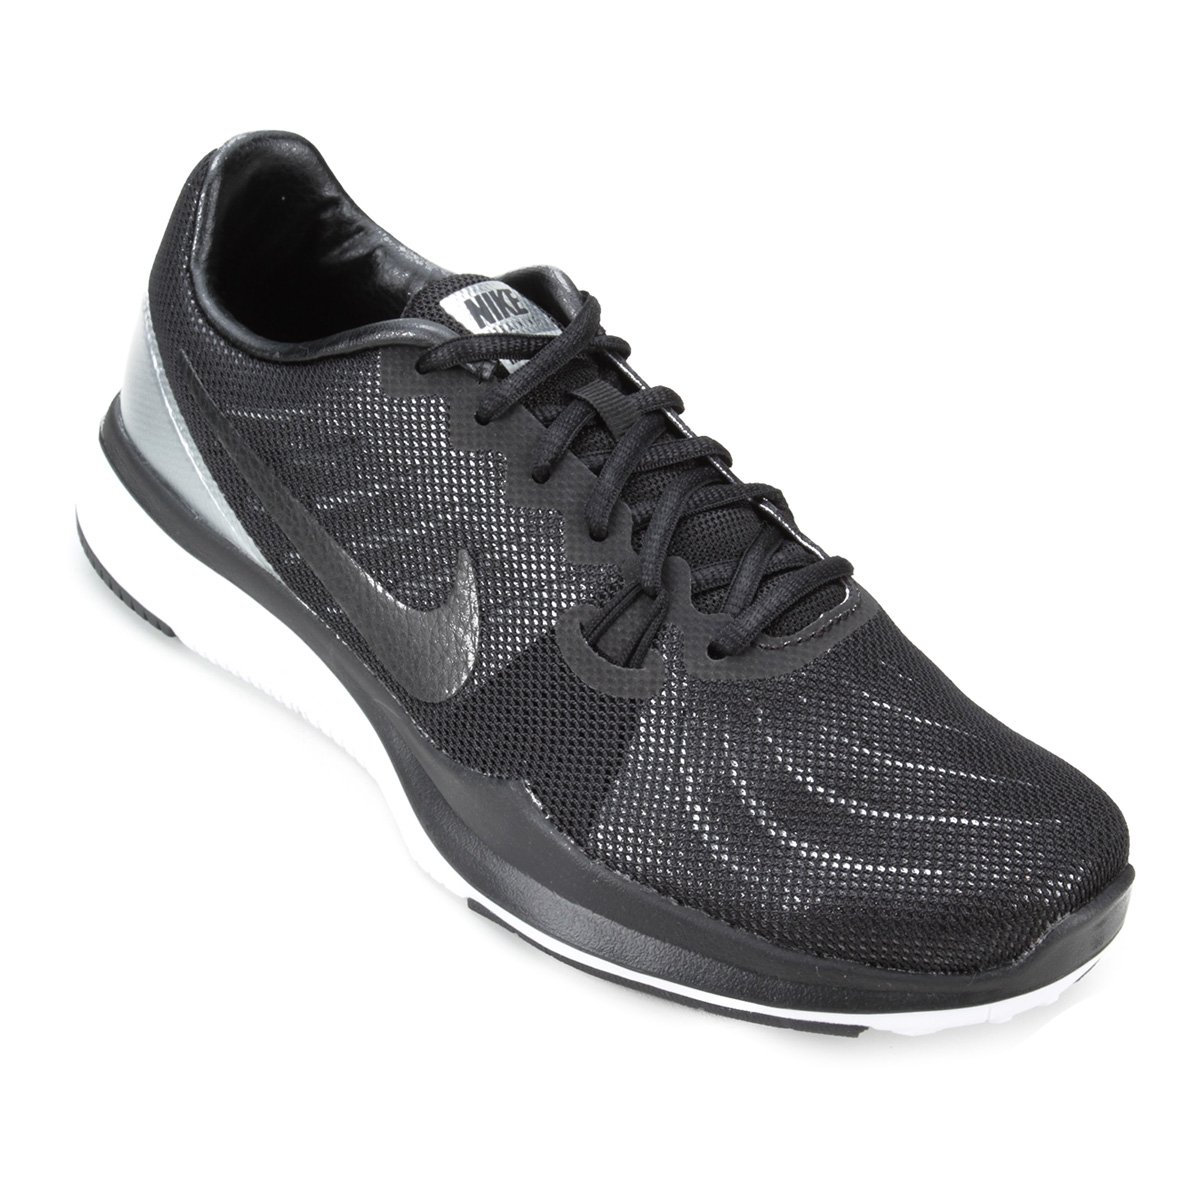 1b7329f471 Tênis Nike In-Season TR 7 PRM Feminino - Compre Agora